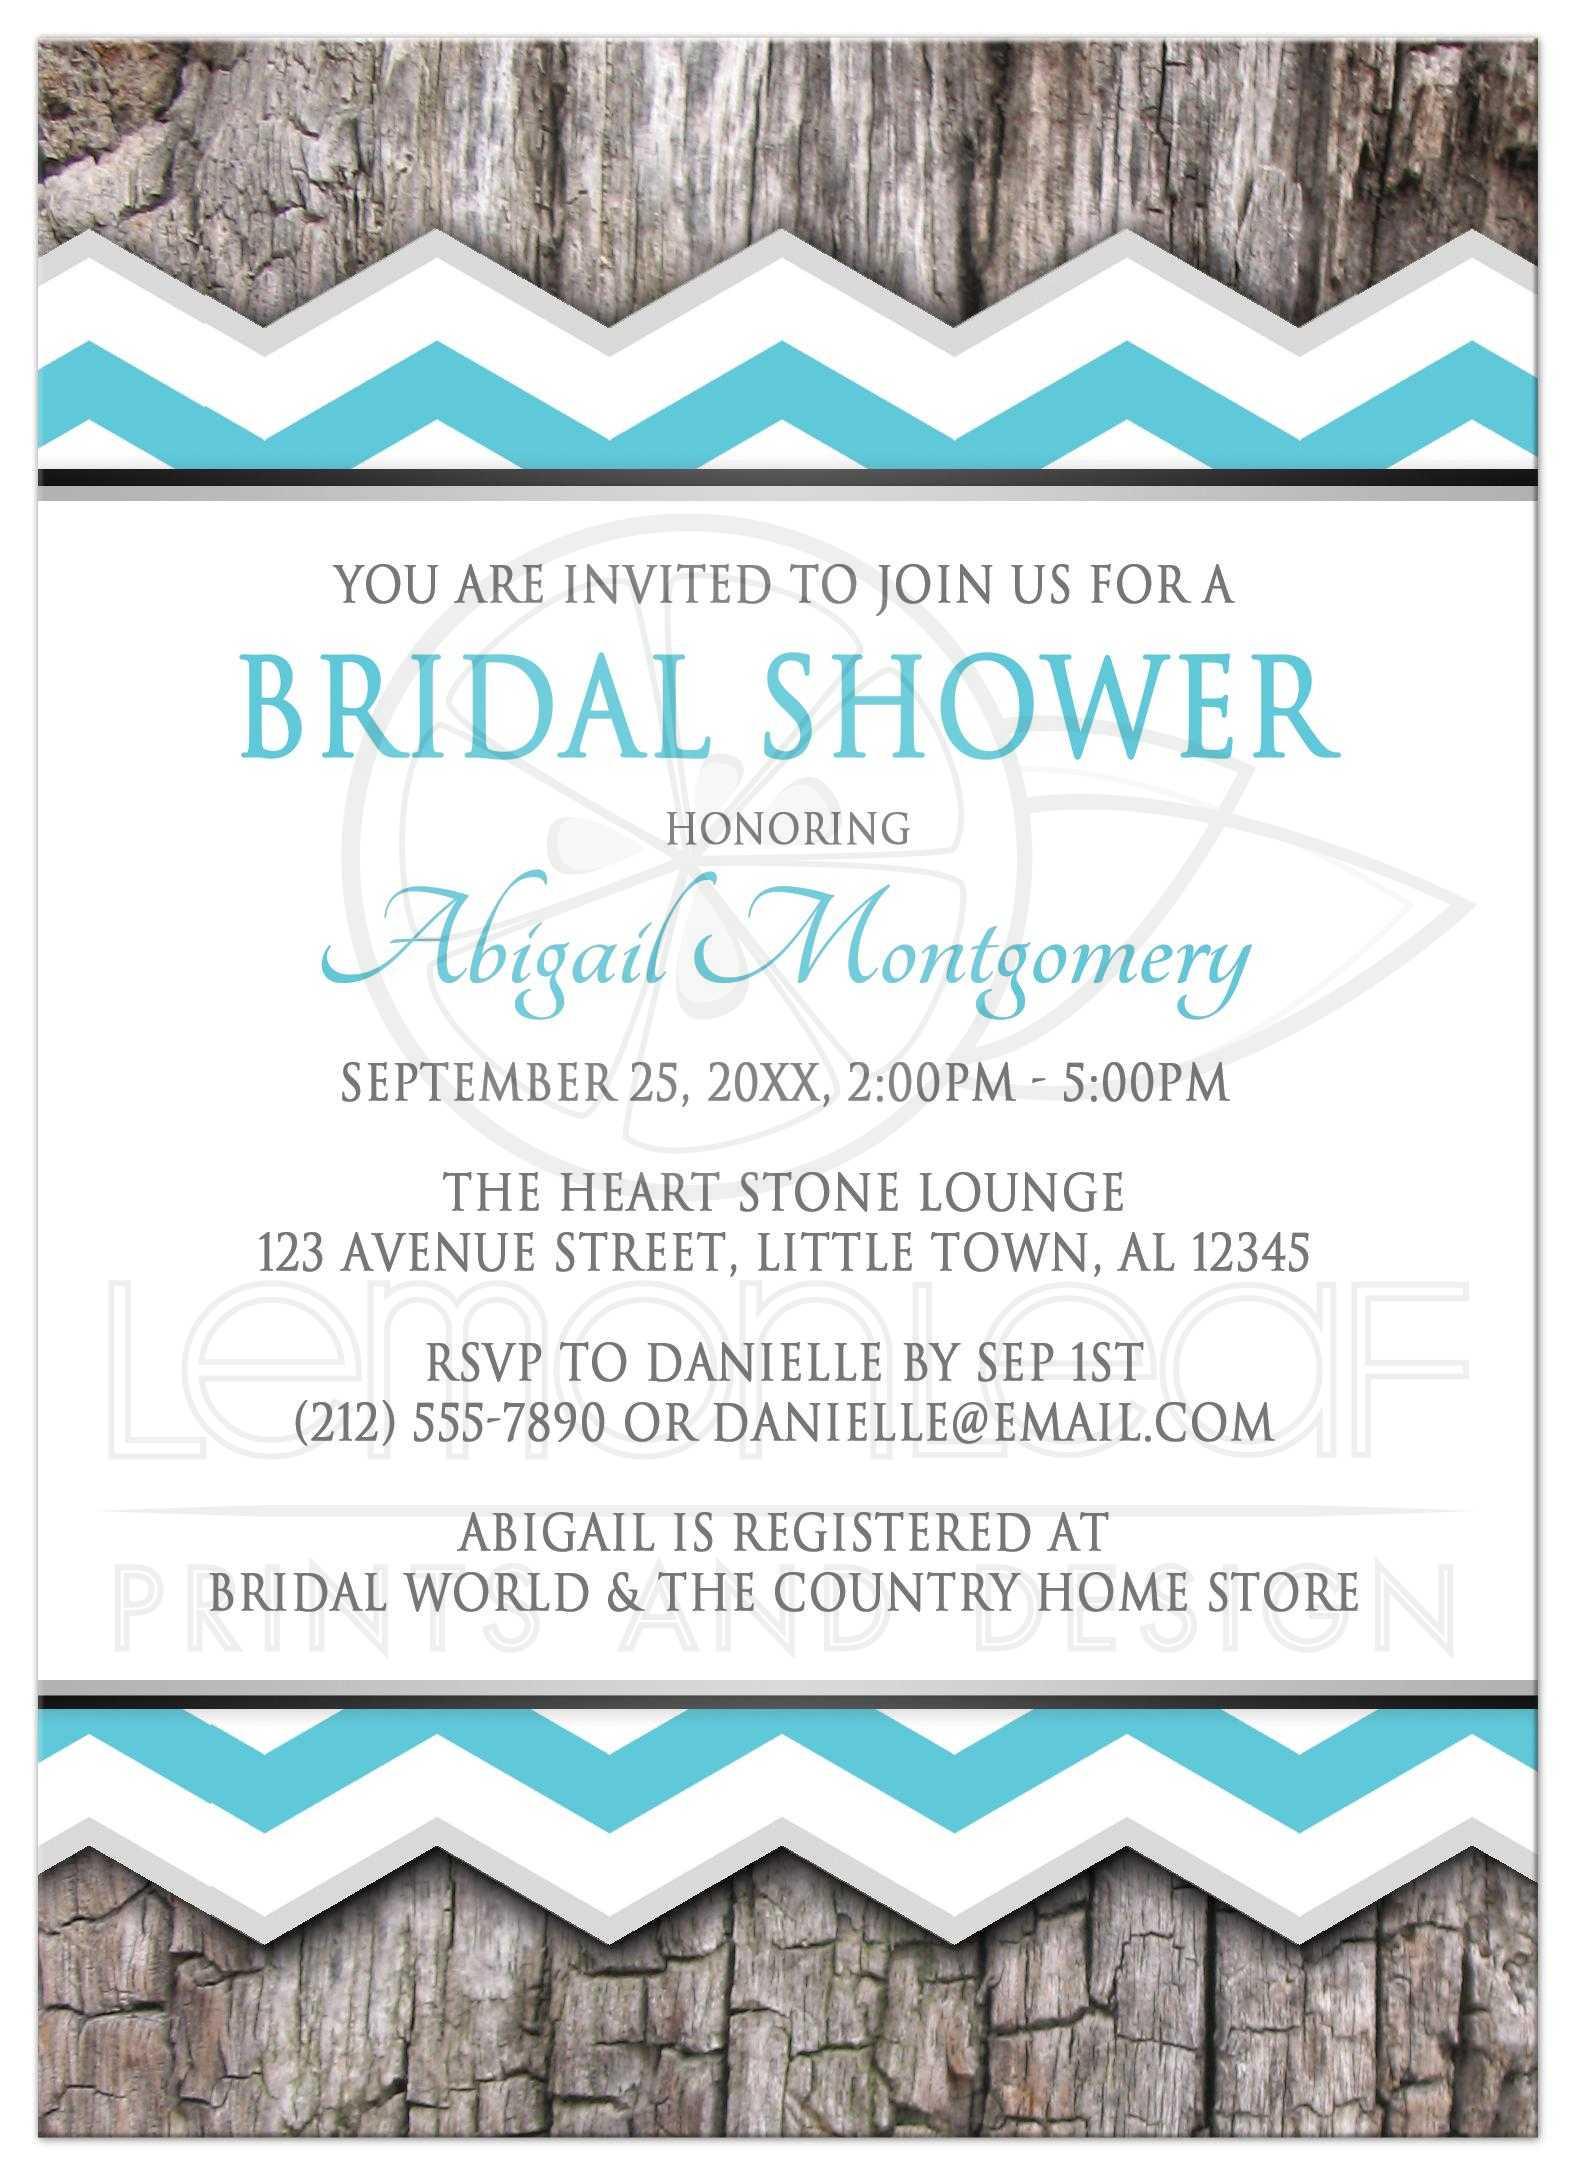 Bridal Shower Invitations - Turquoise Chevron & Rustic Wood